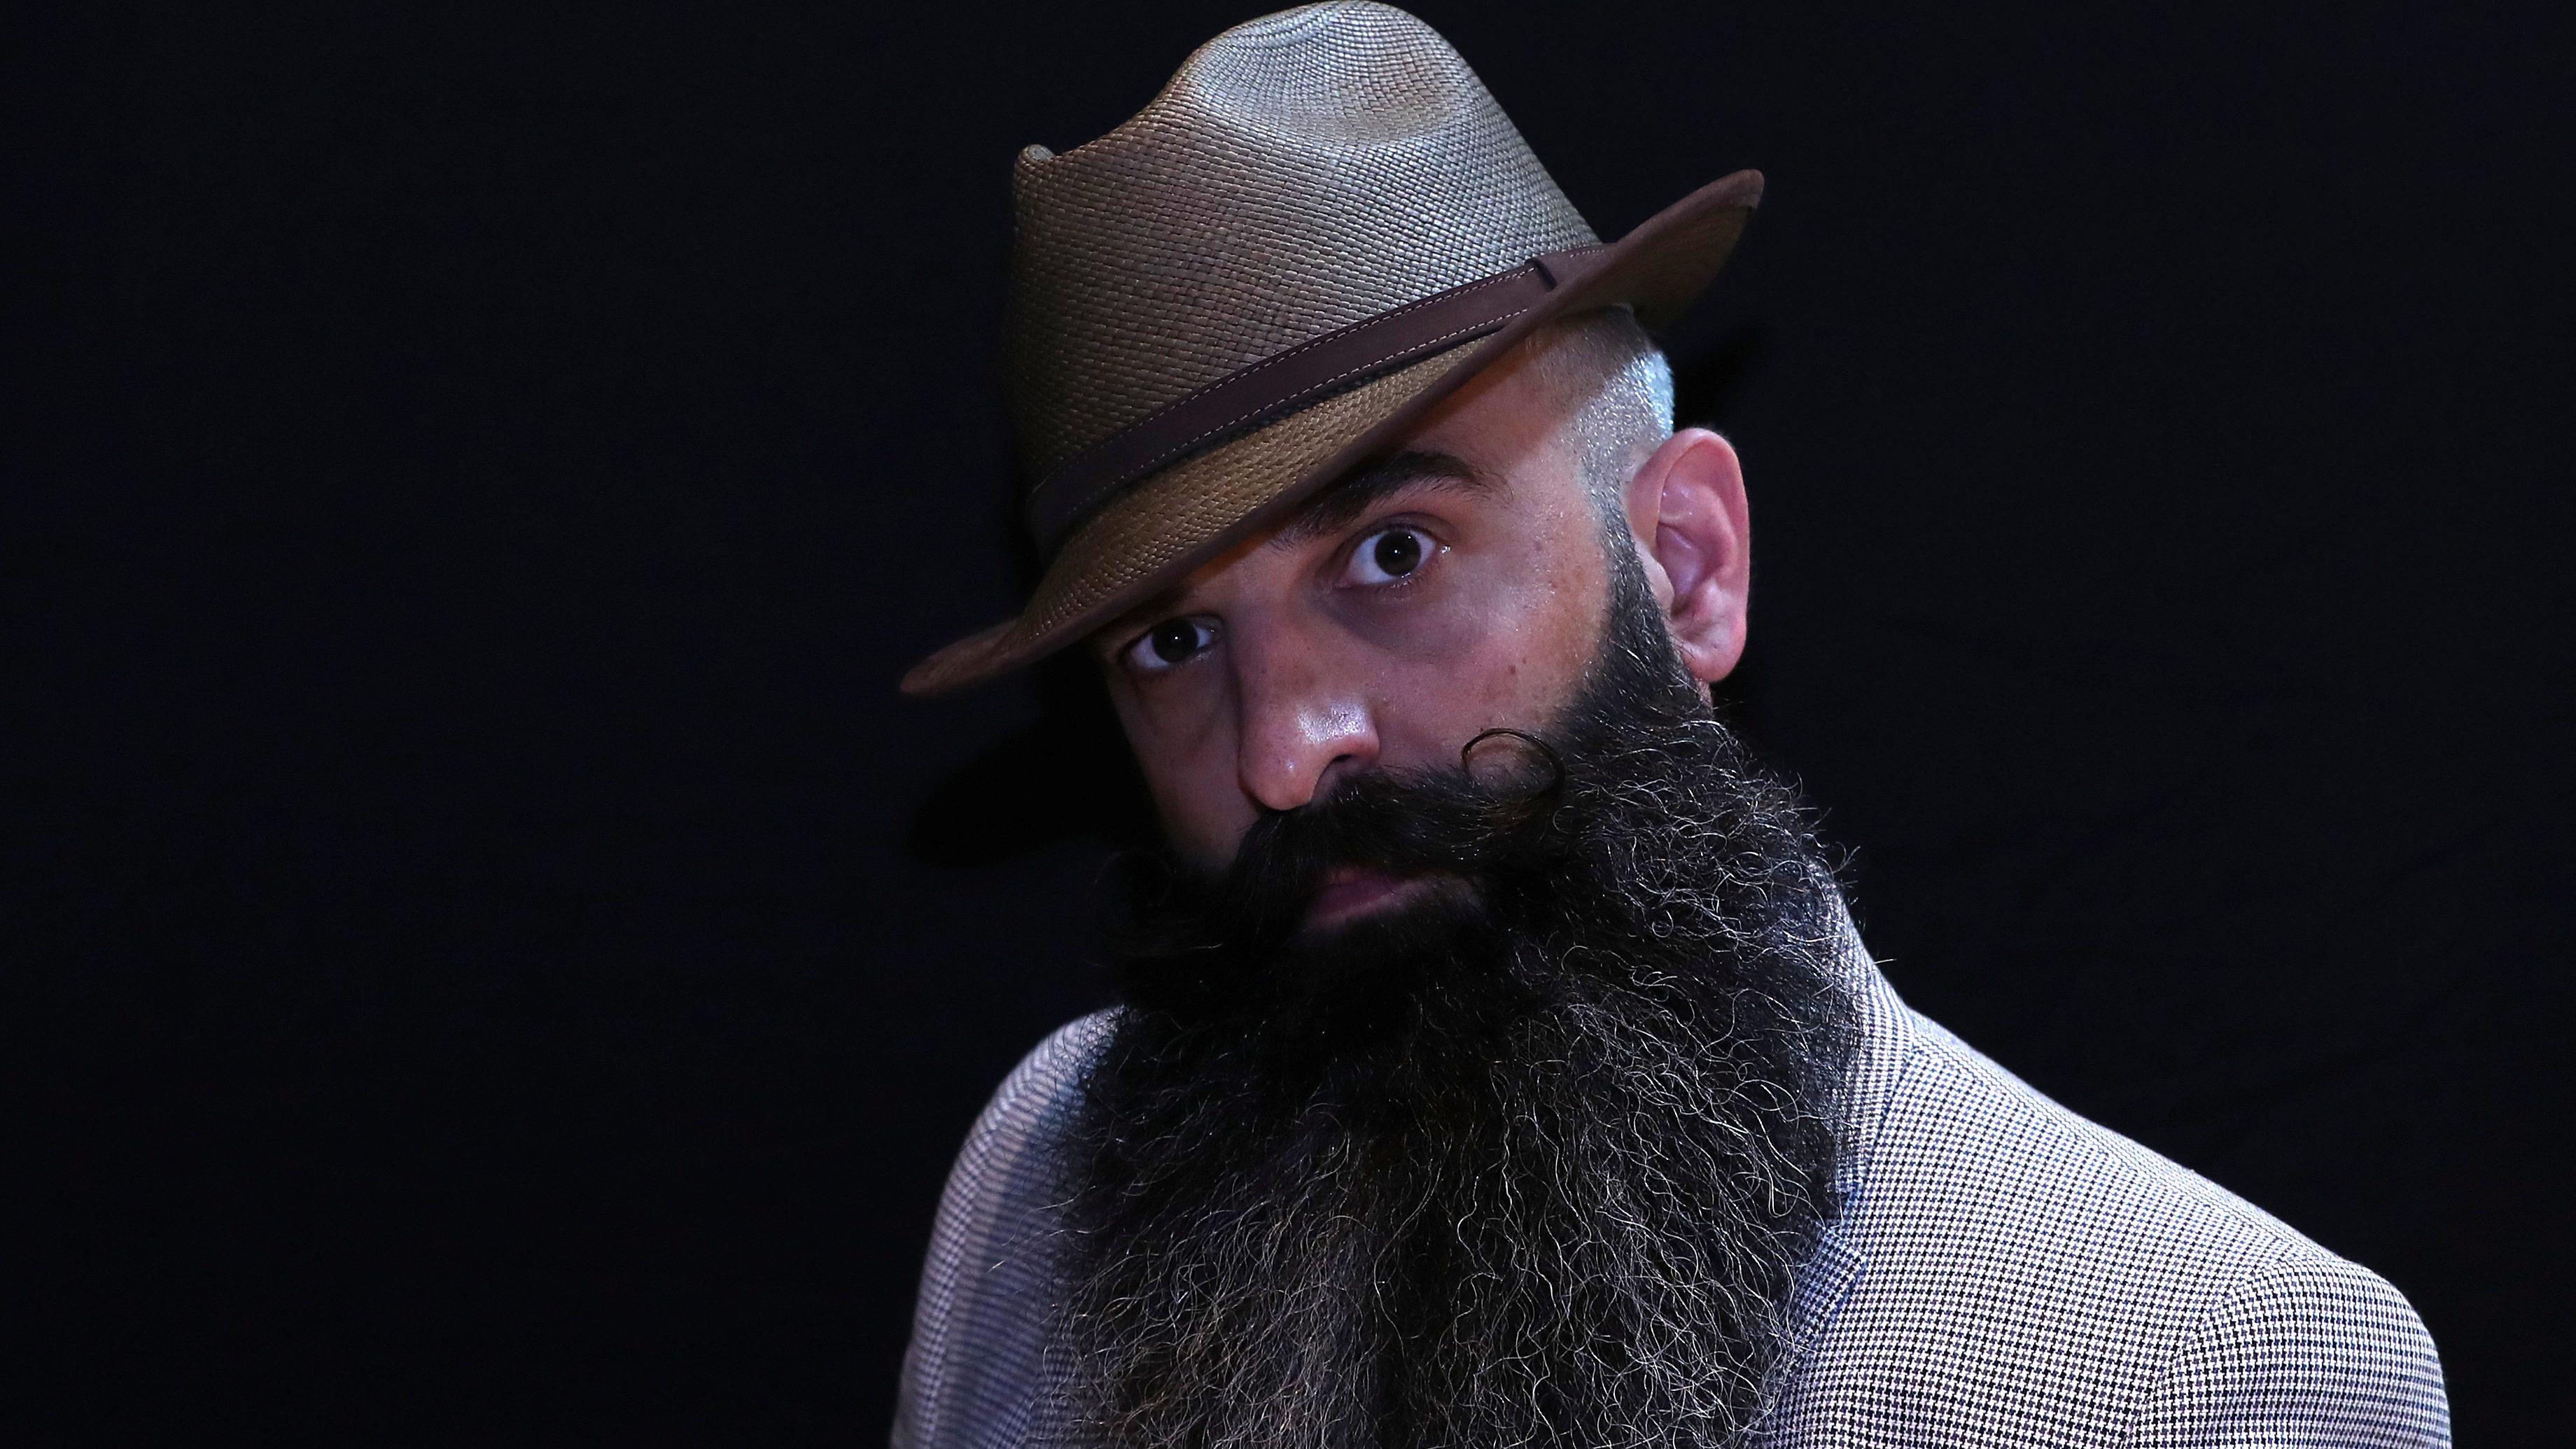 Peachy Pgs Gillette Writes Off 8 Billion As Men Stop Shaving Quartz Schematic Wiring Diagrams Amerangerunnerswayorg